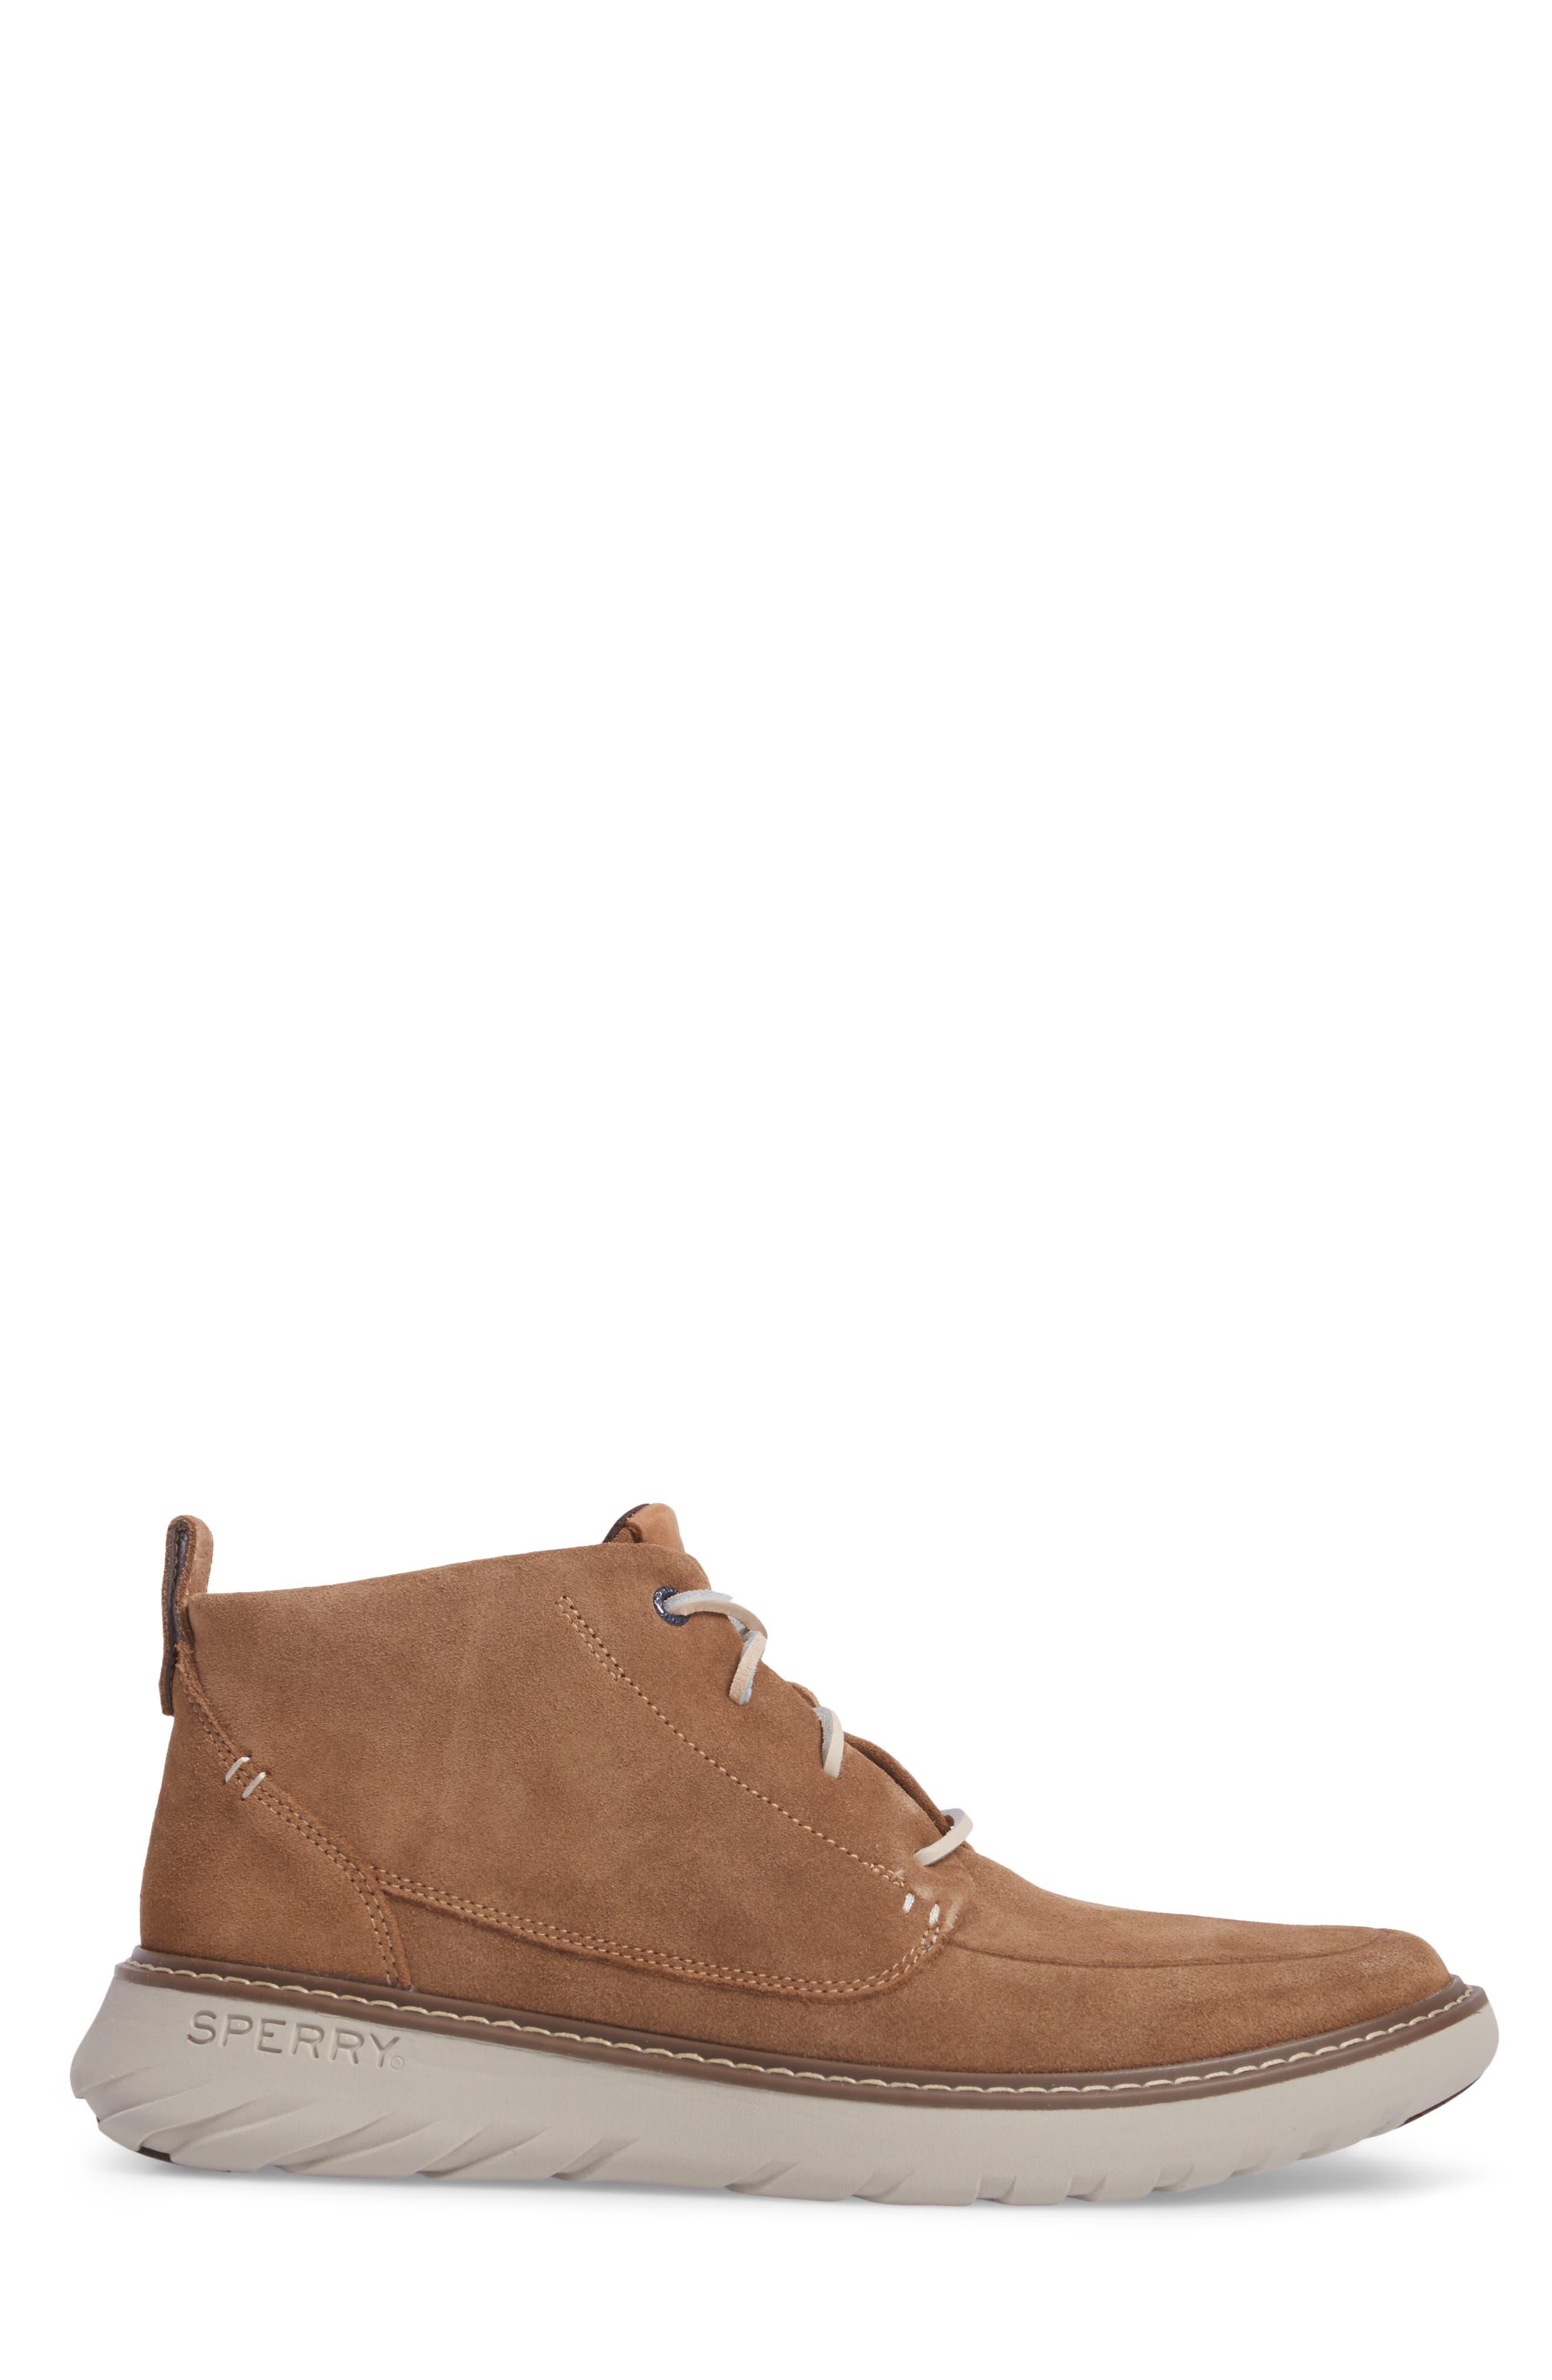 Element Chukka Boot,                             Alternate thumbnail 3, color,                             Caramel Leather